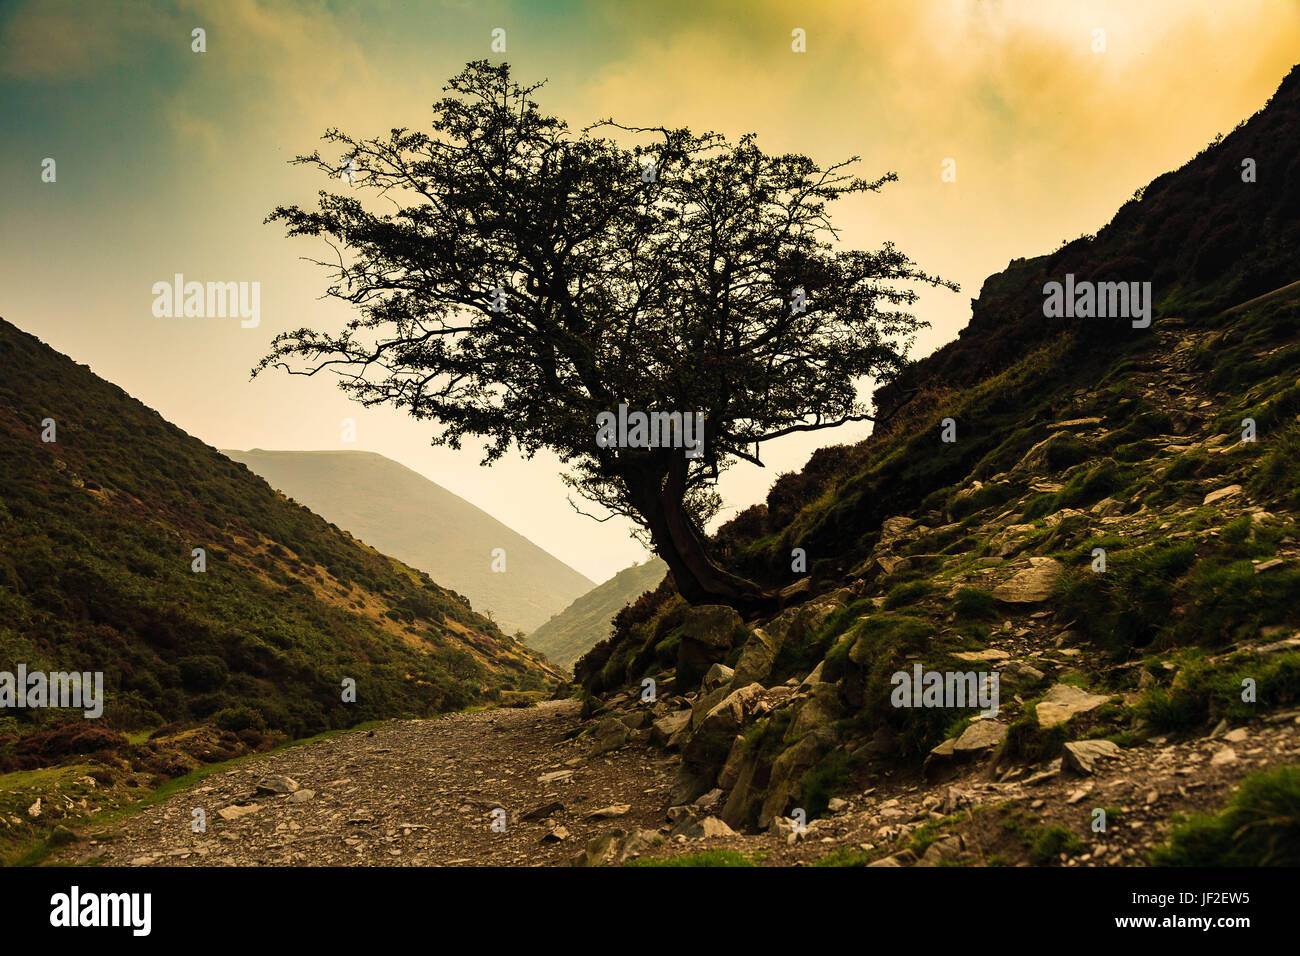 Hawthorn Tree - Stock Image